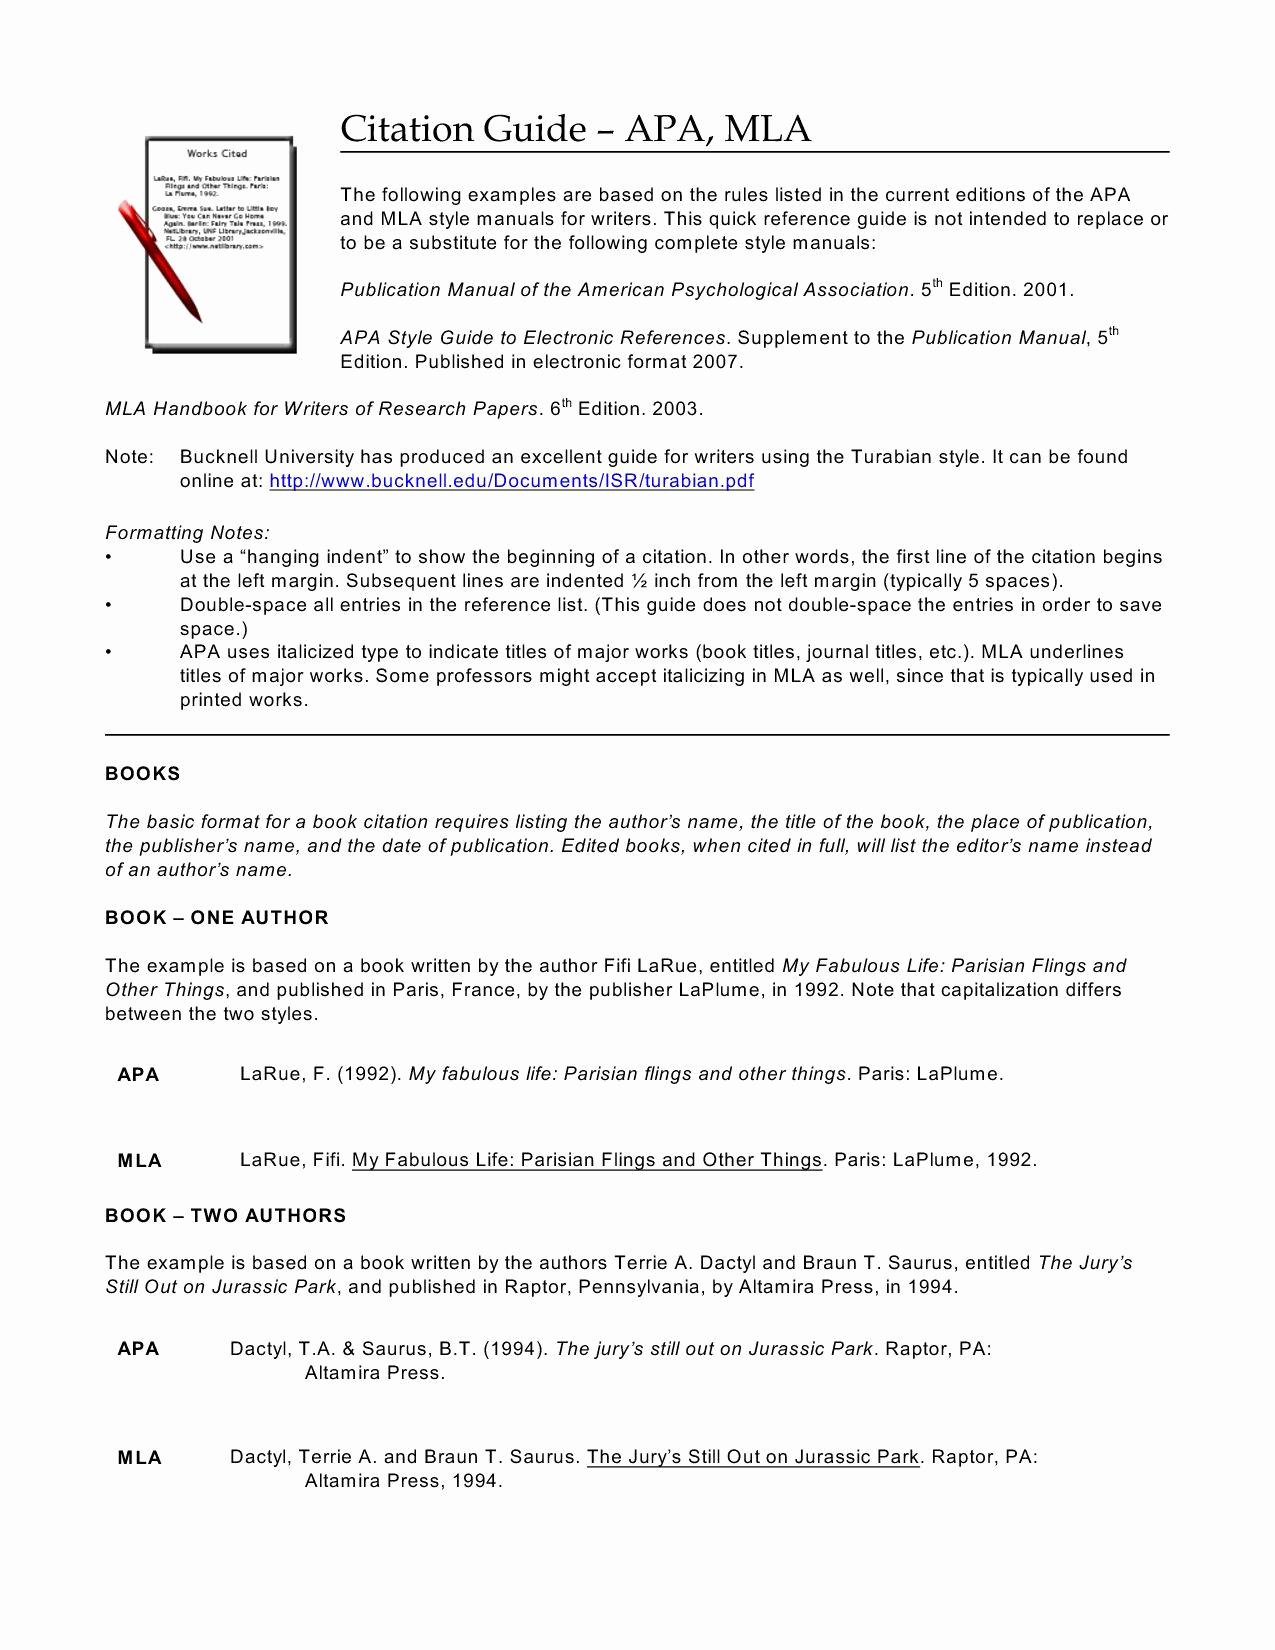 Bibliography Practice Worksheets Elegant Easily 20 Bibliography Practice Worksheets Worksheet